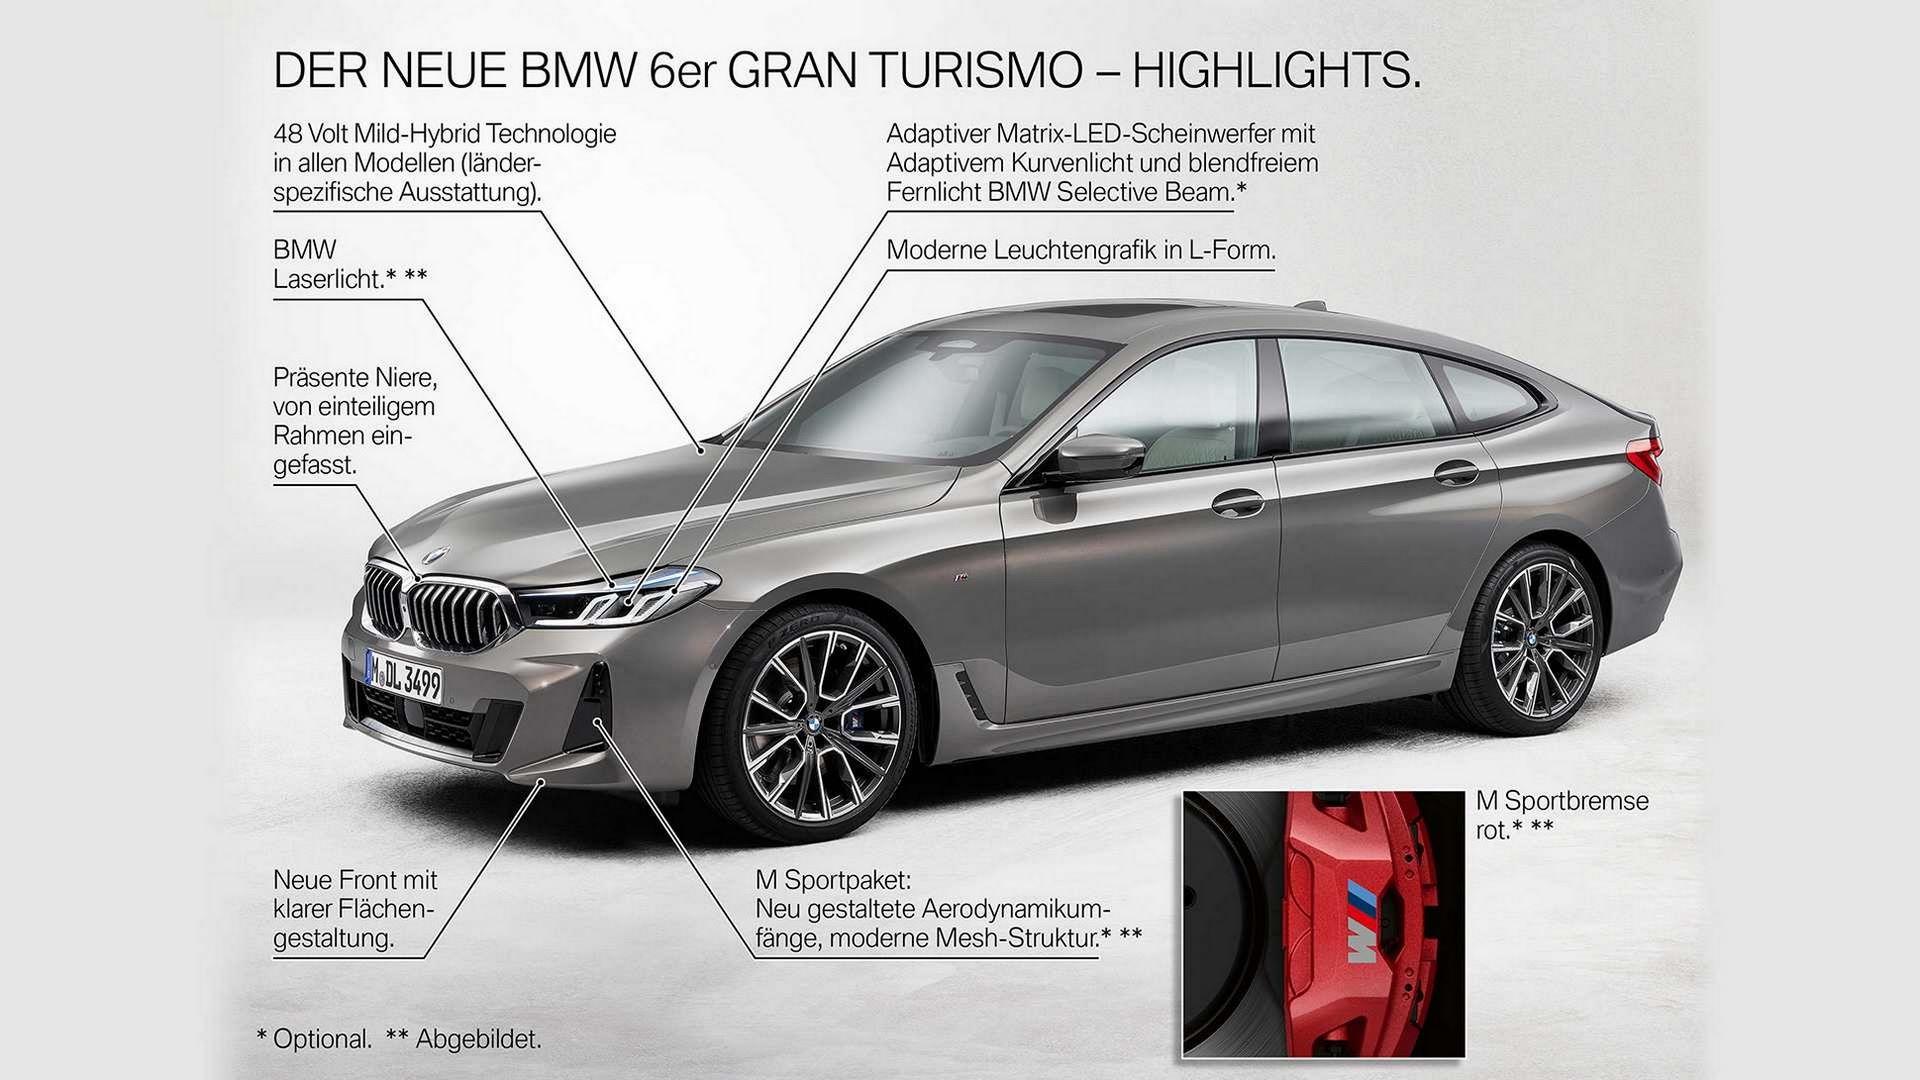 BMW-6-Series-GT-Gran-Turismo-facelift-2021-43